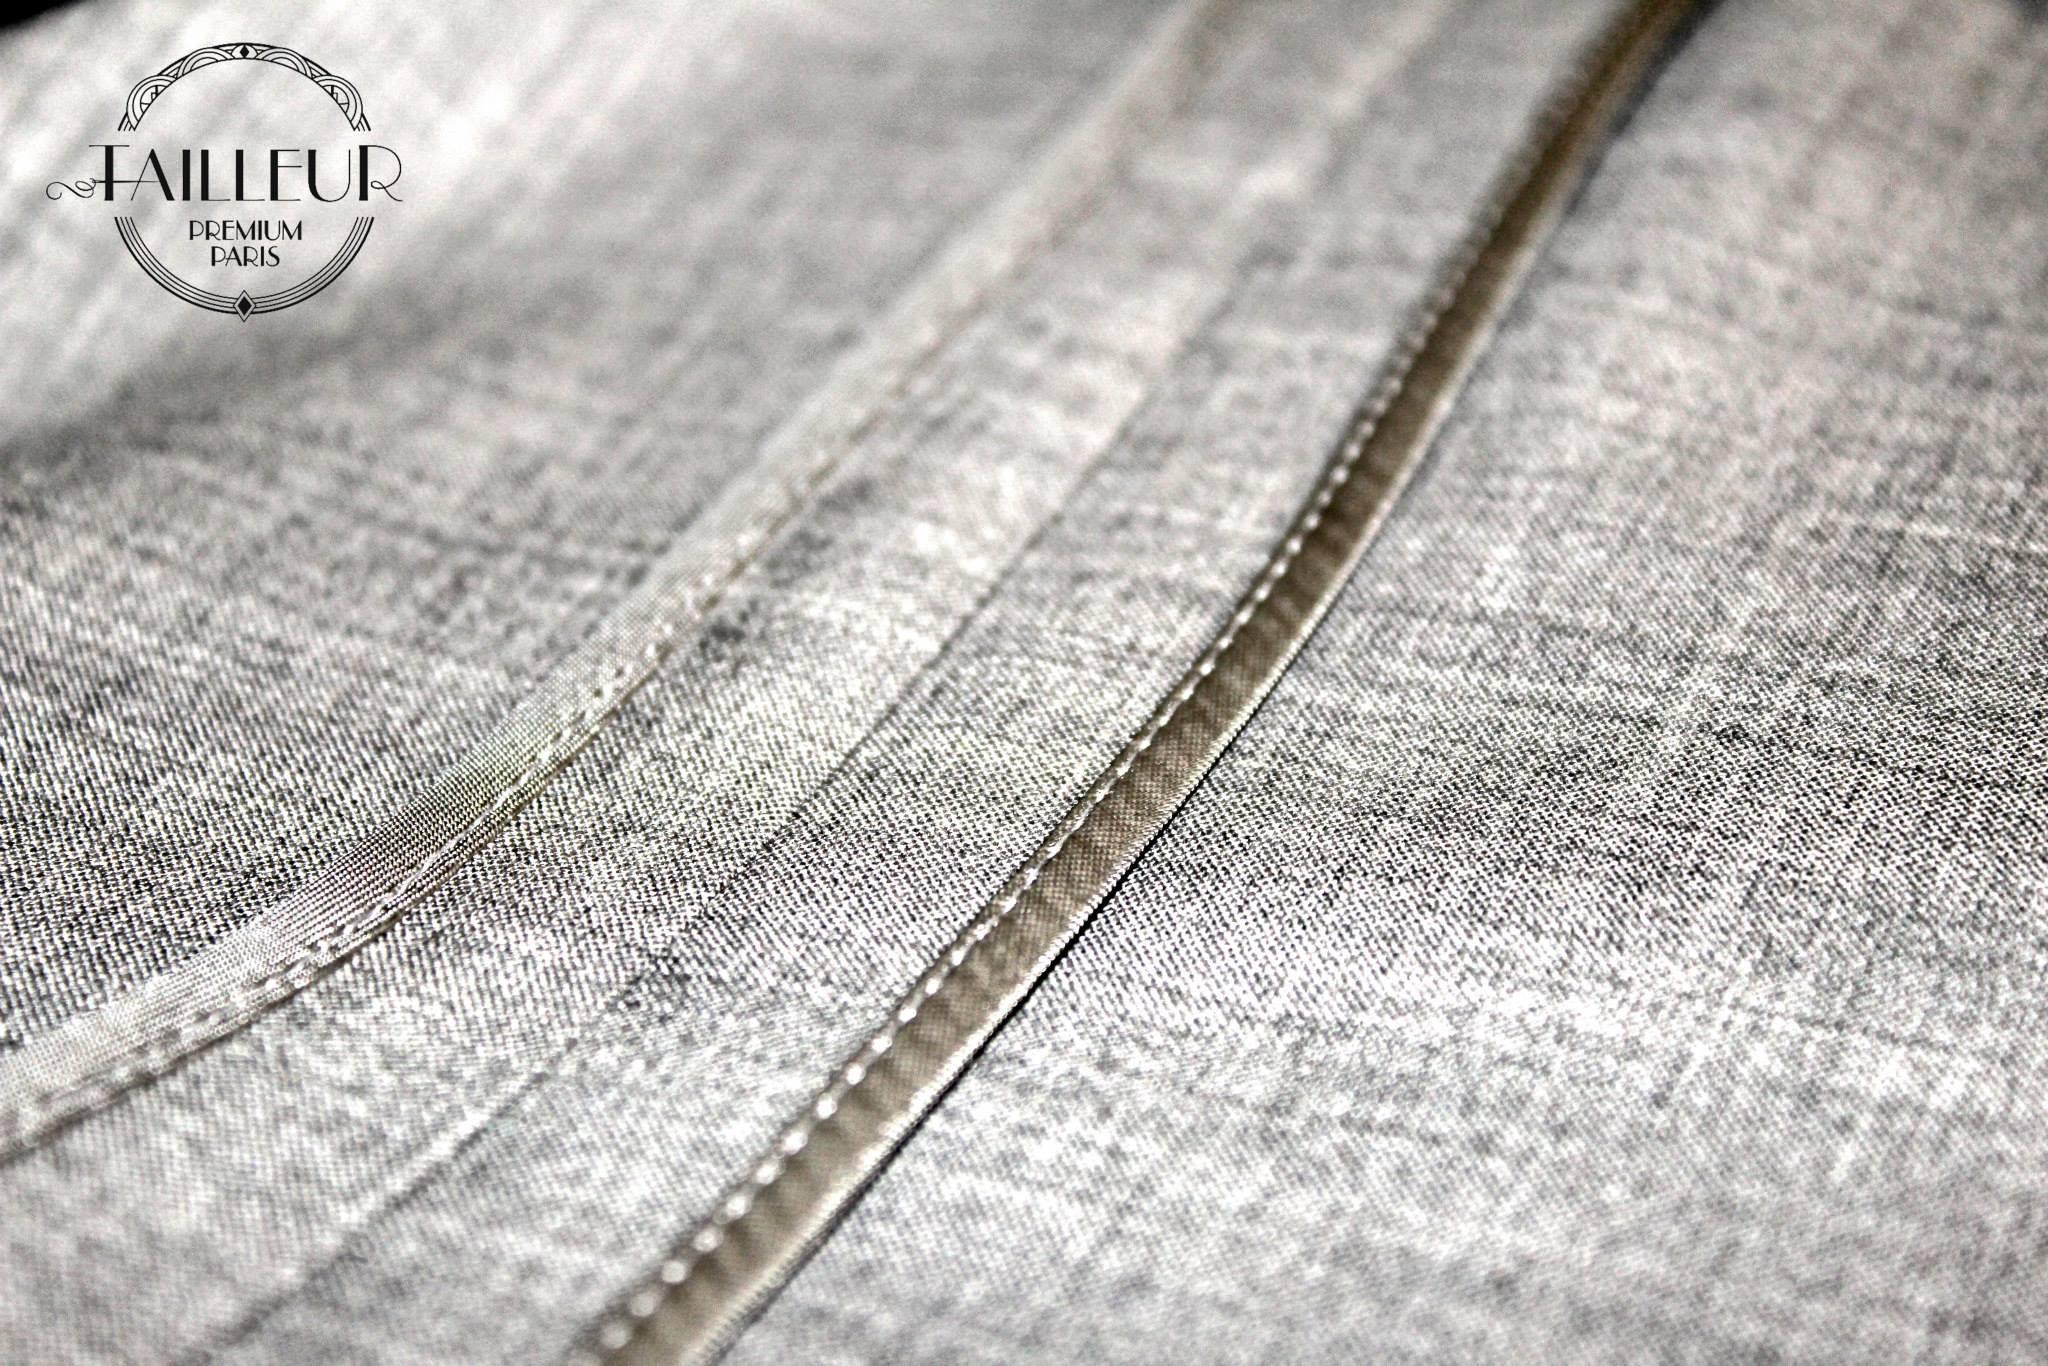 Tailleur Premium Paris - costume et tailleur sur-mesure